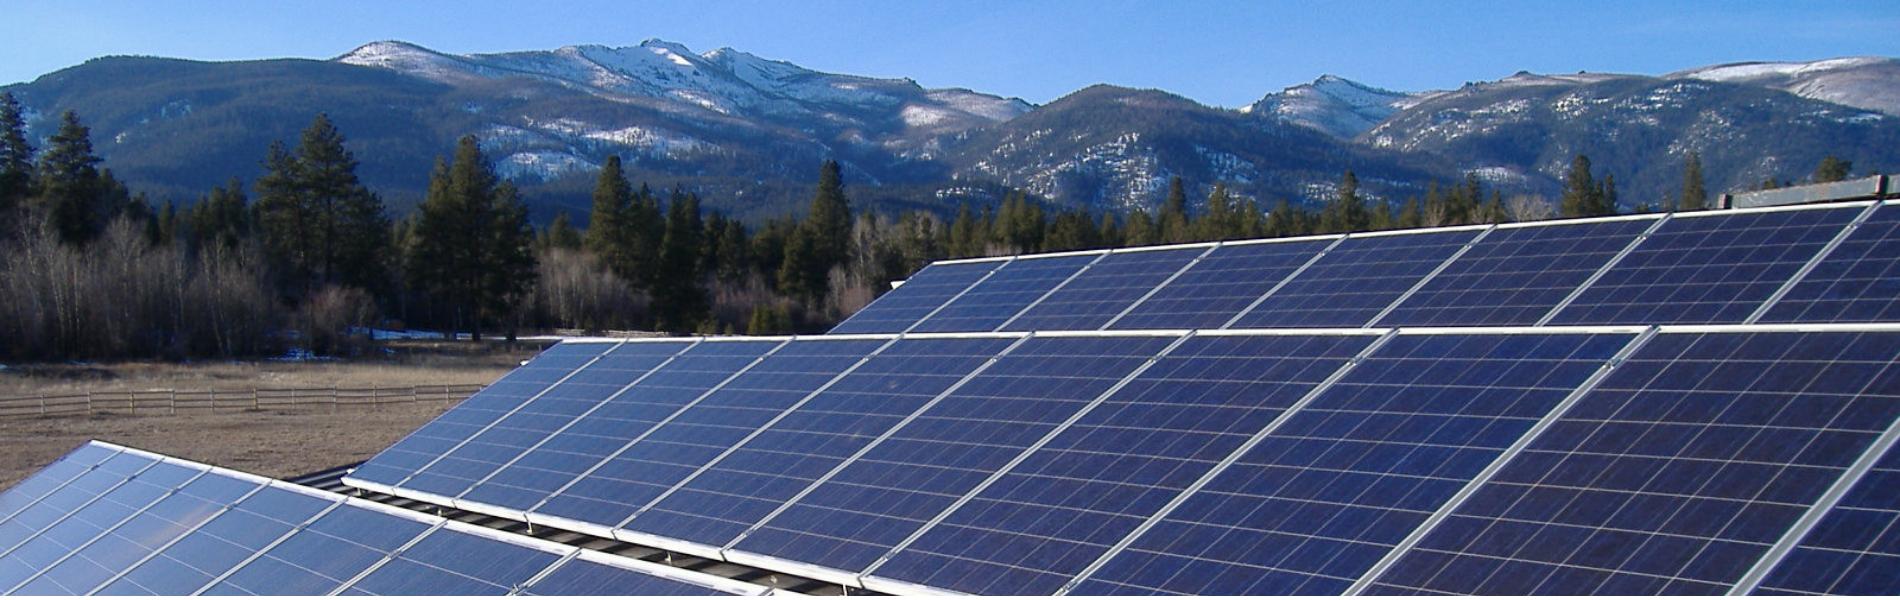 Renewable Energy Information